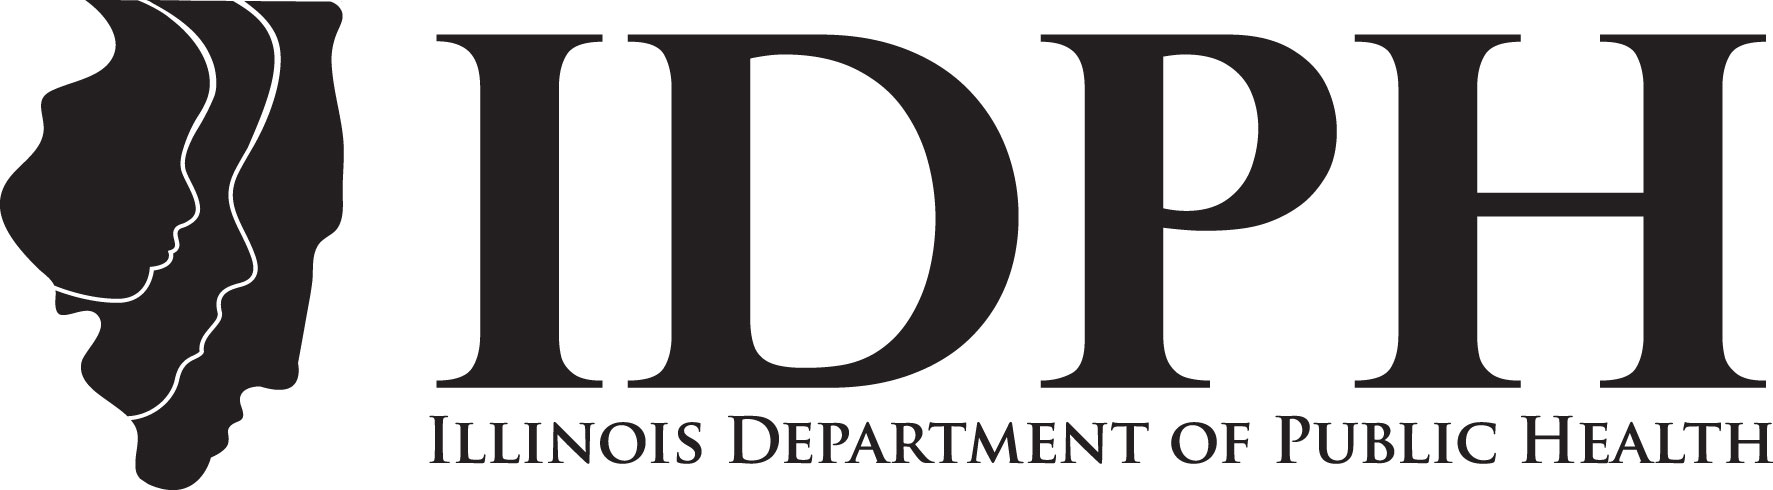 Illinois Dept of Public Health - Healthcare Worker Act